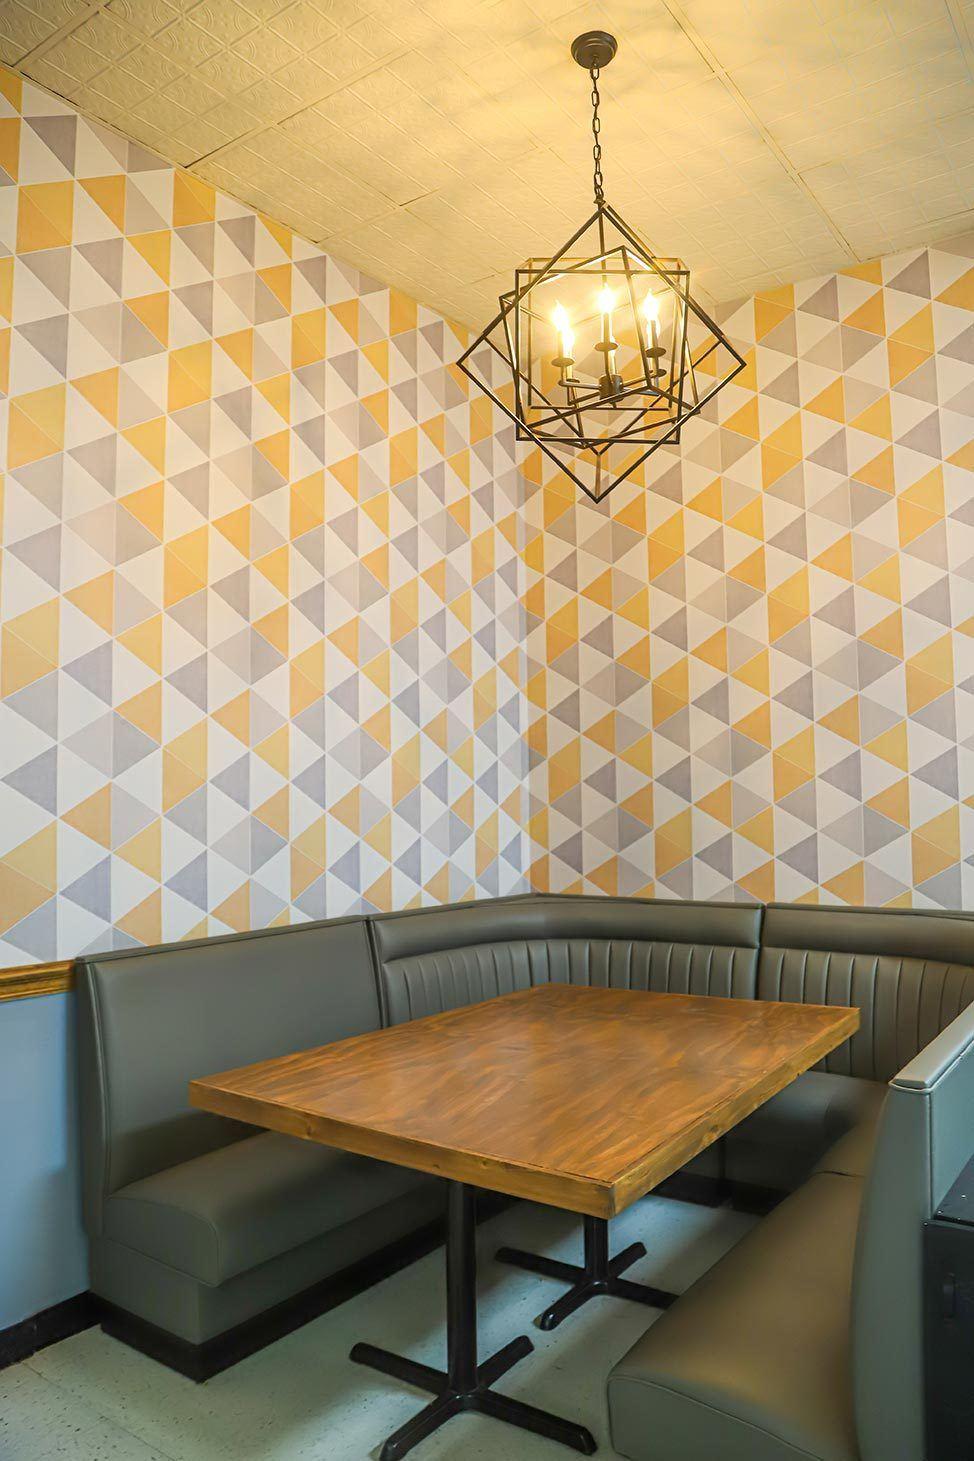 Turtle Leaf Cafe in Elmira, New York